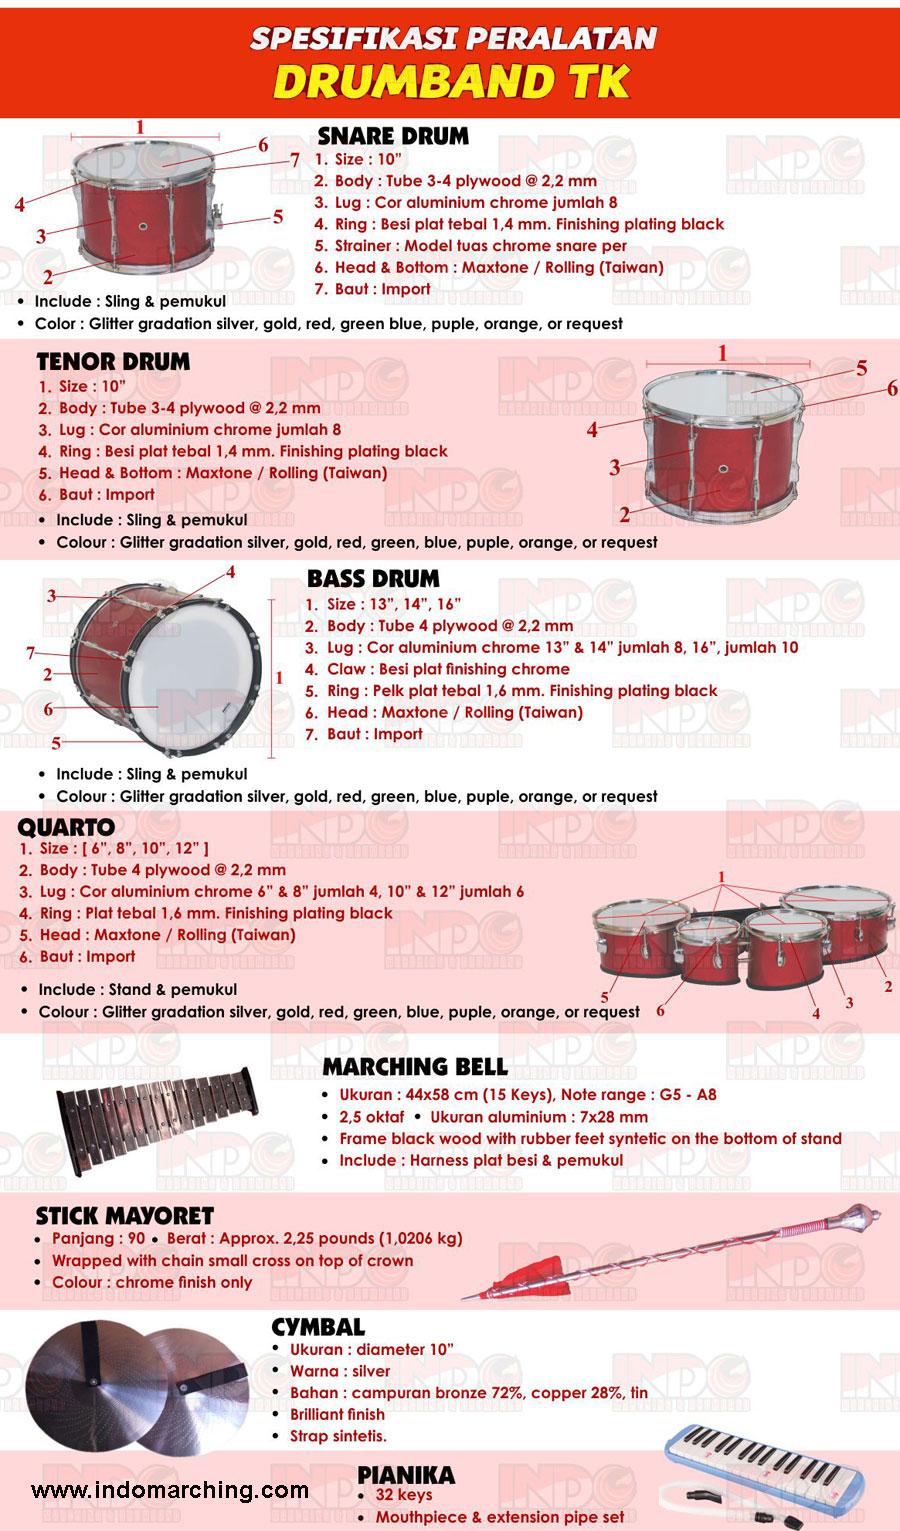 Alat Drumband TK